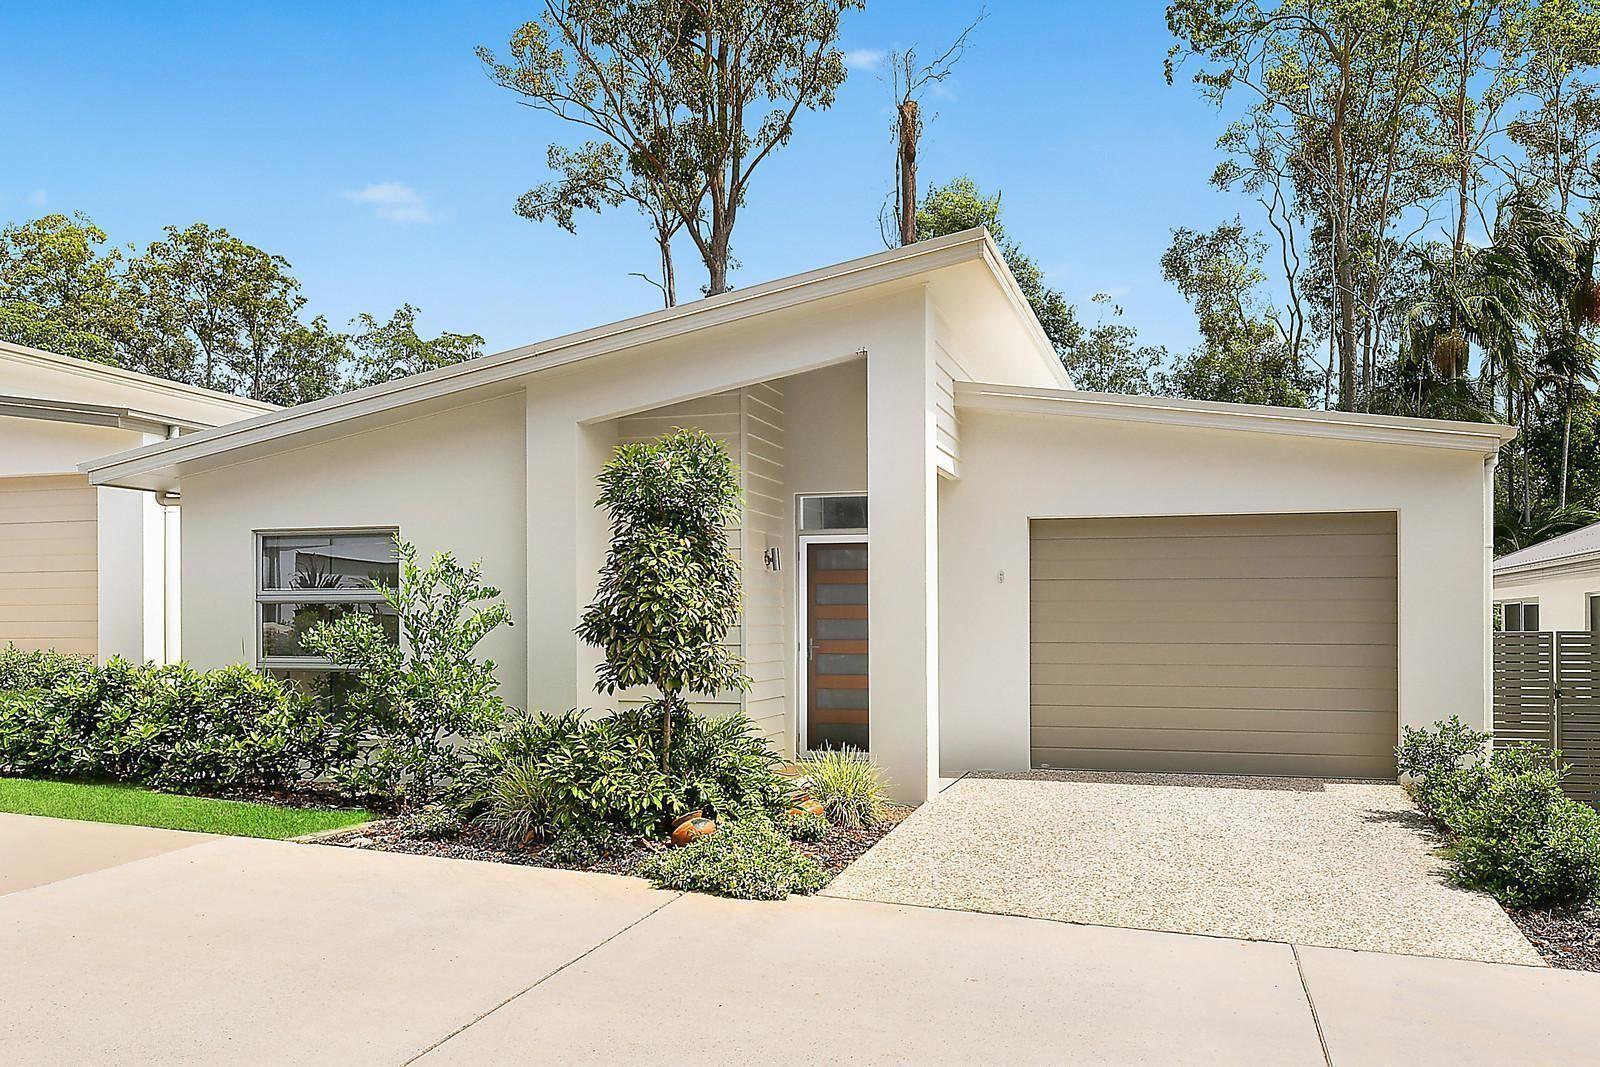 6/25 Owen Creek Road, Forest Glen QLD 4556, Image 0